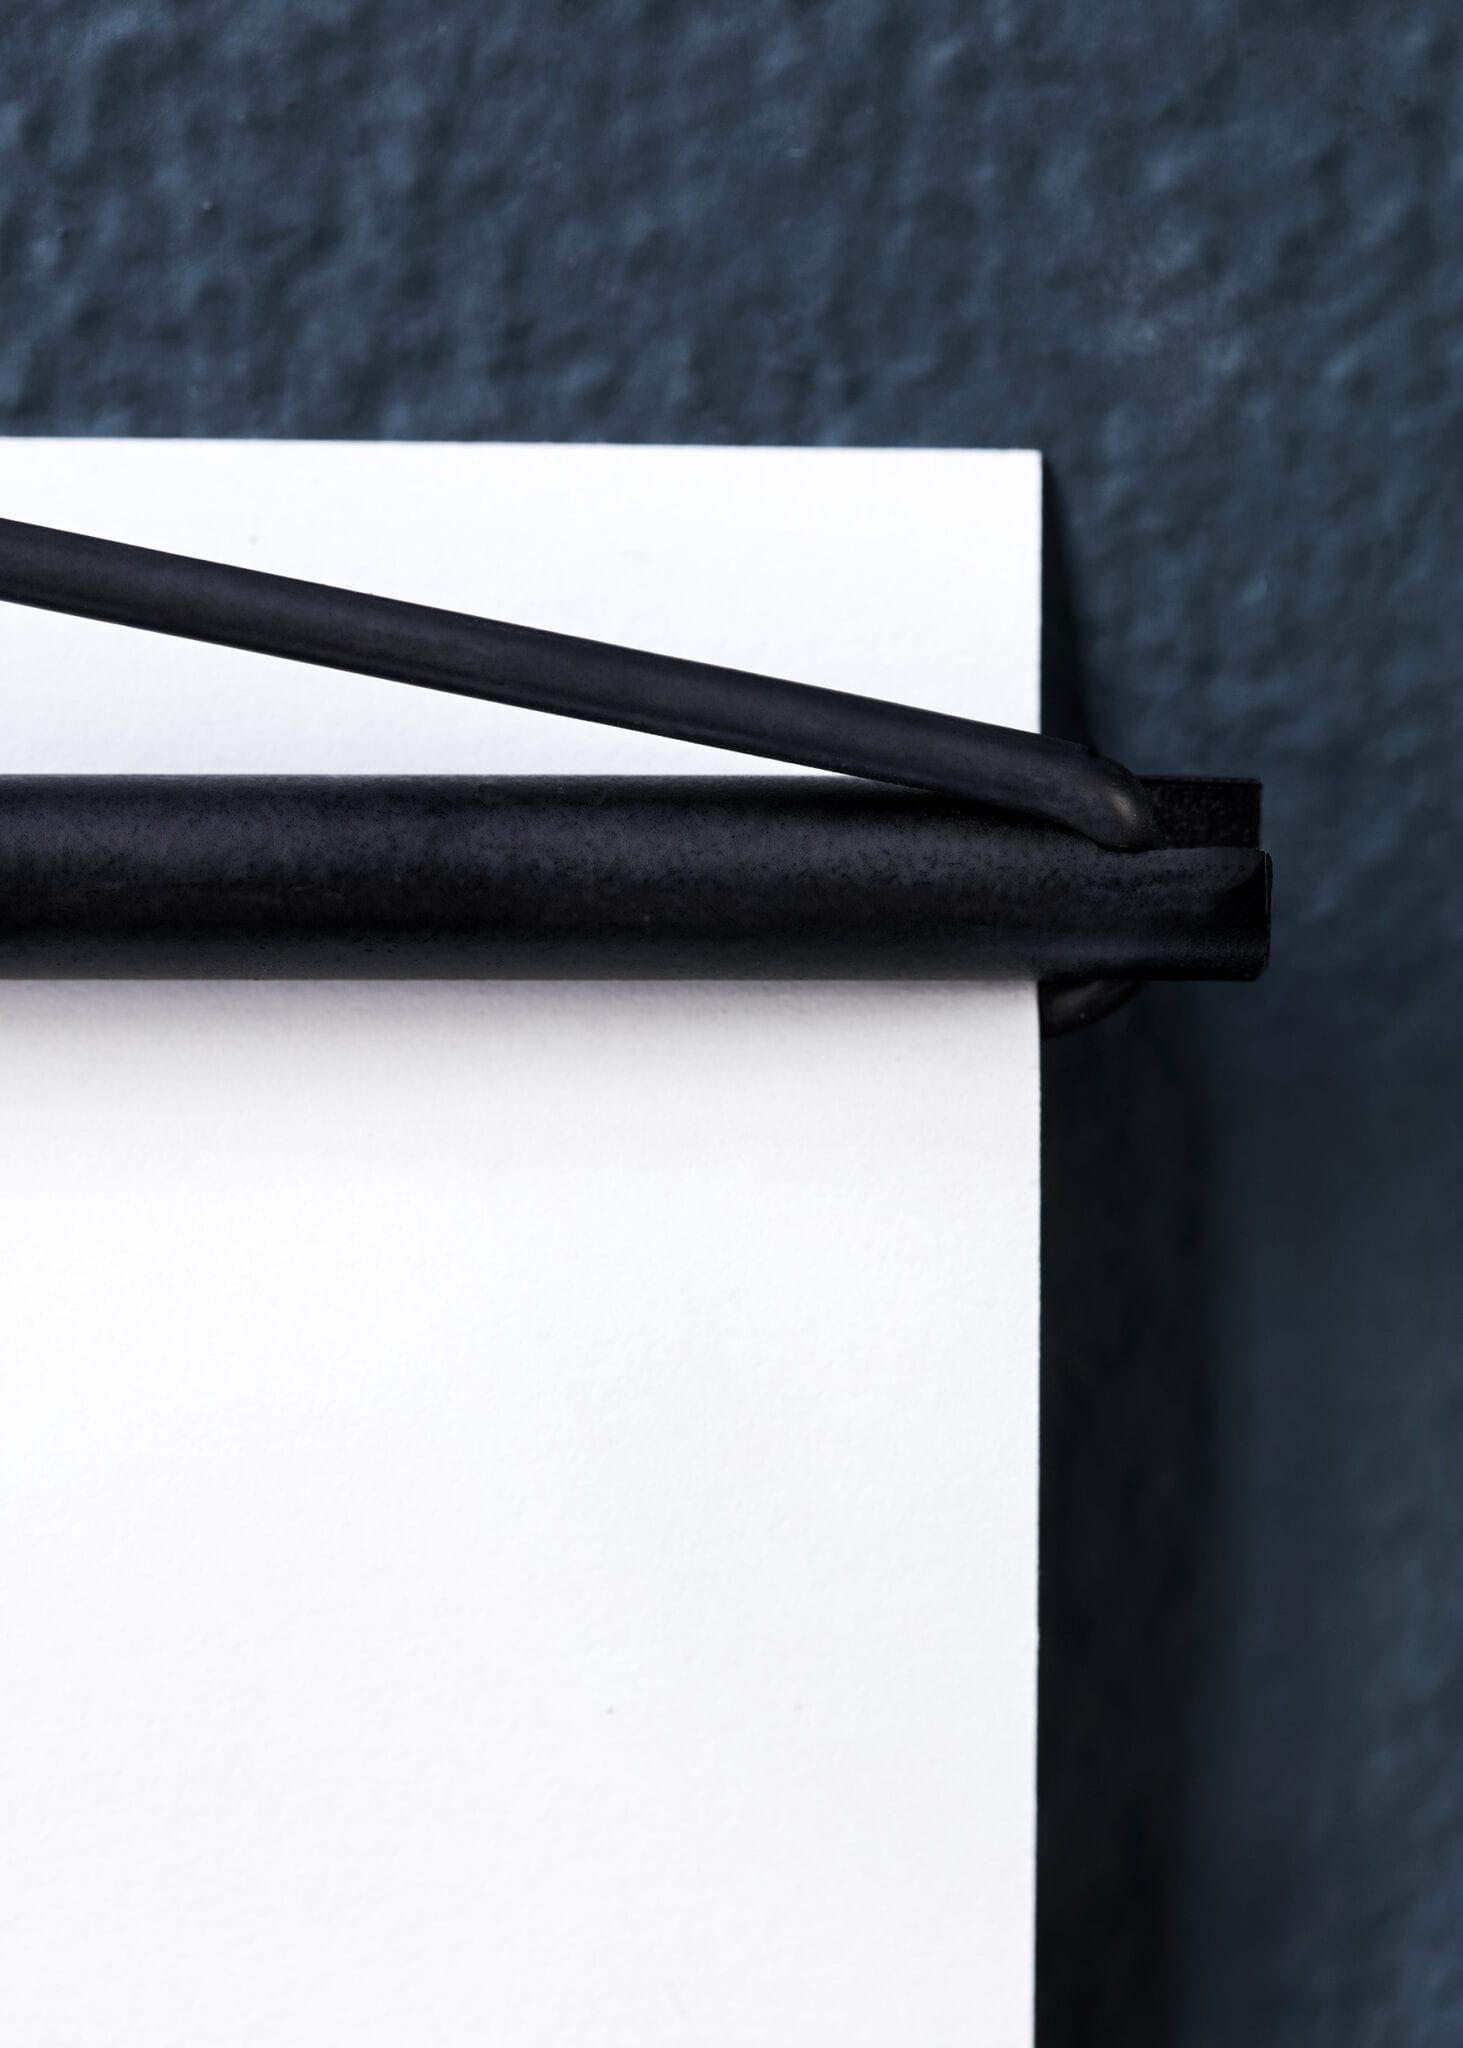 Moebe Poster Hanger Black - THE POSTER CLUB